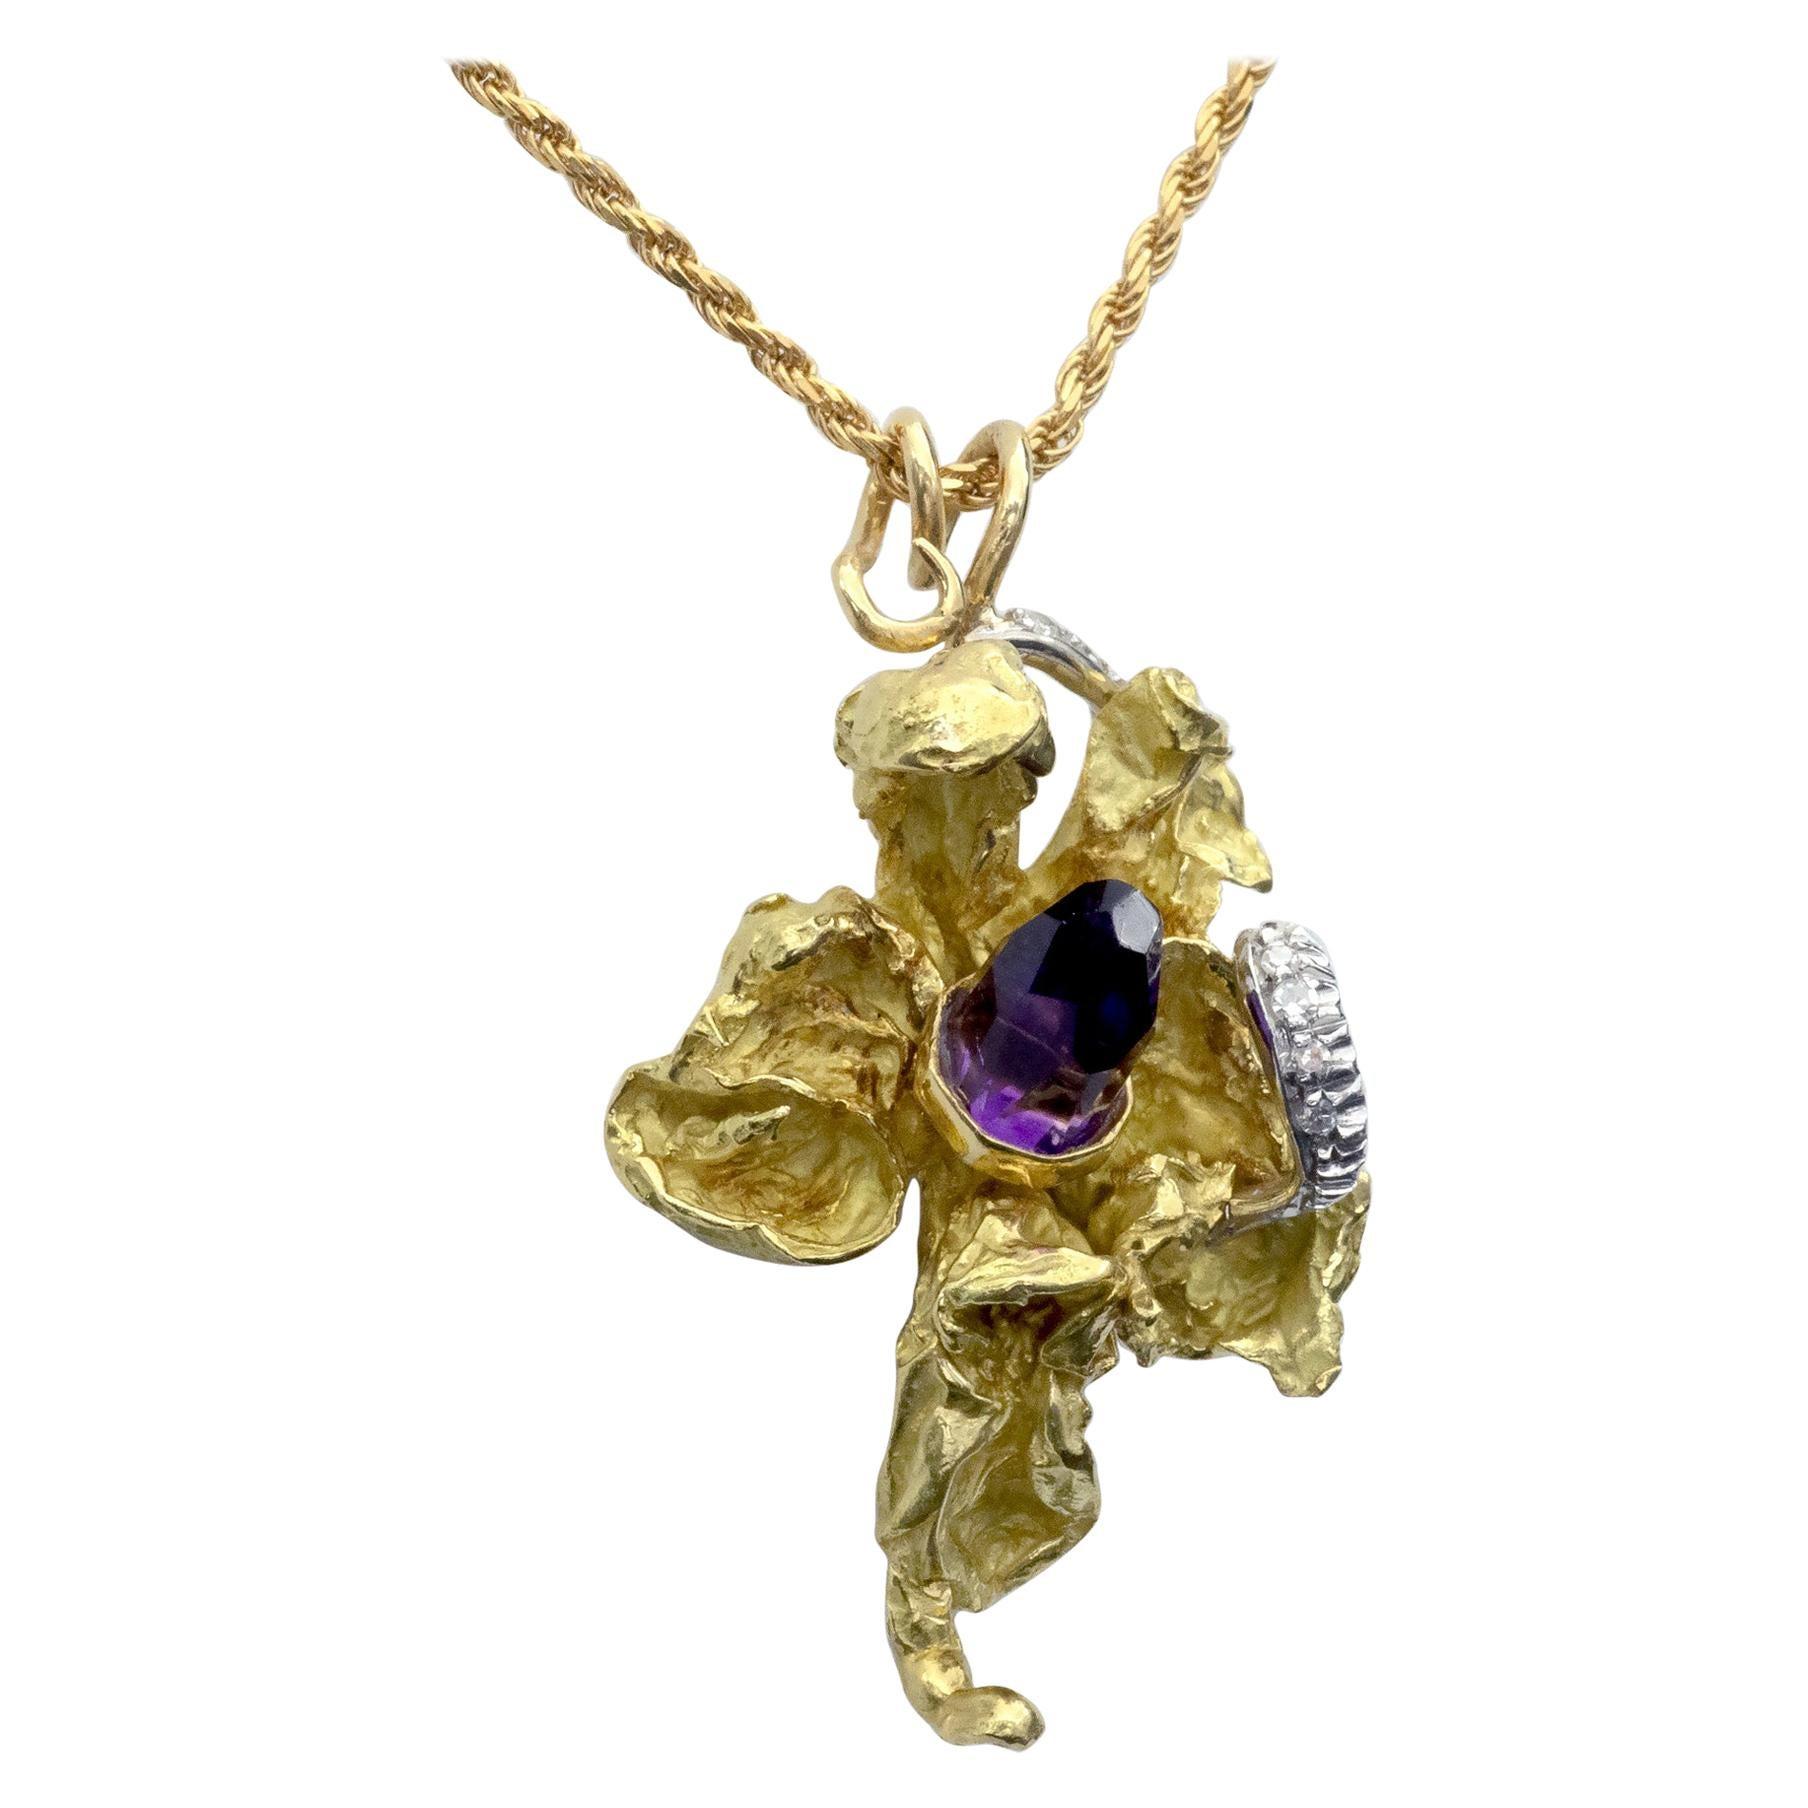 18 Karat Solid Gold Amethyst and Diamond Orchid Pendant